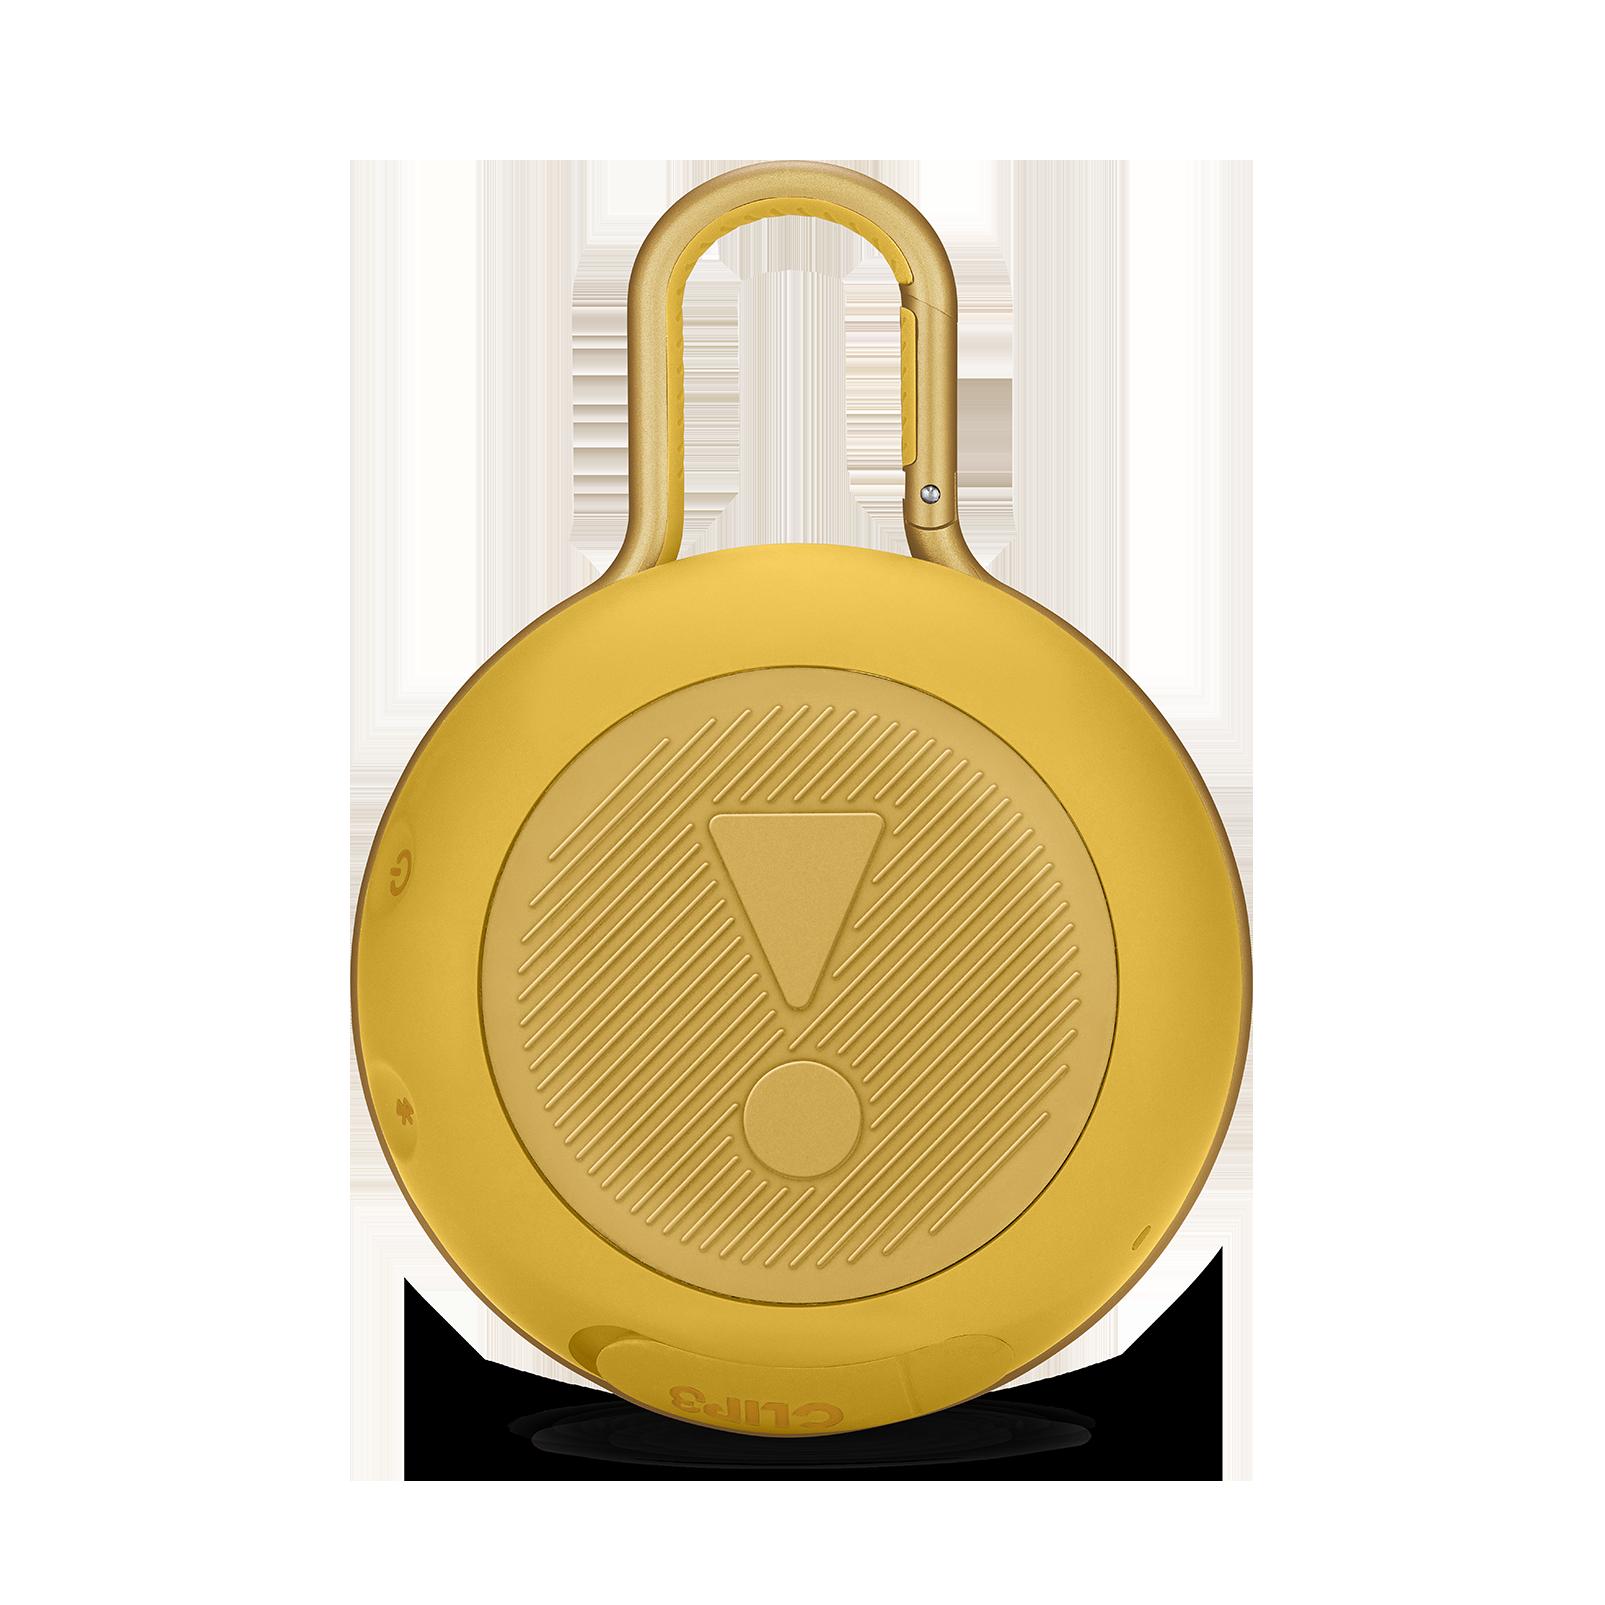 JBL CLIP 3 - Mustard Yellow - Portable Bluetooth® speaker - Back